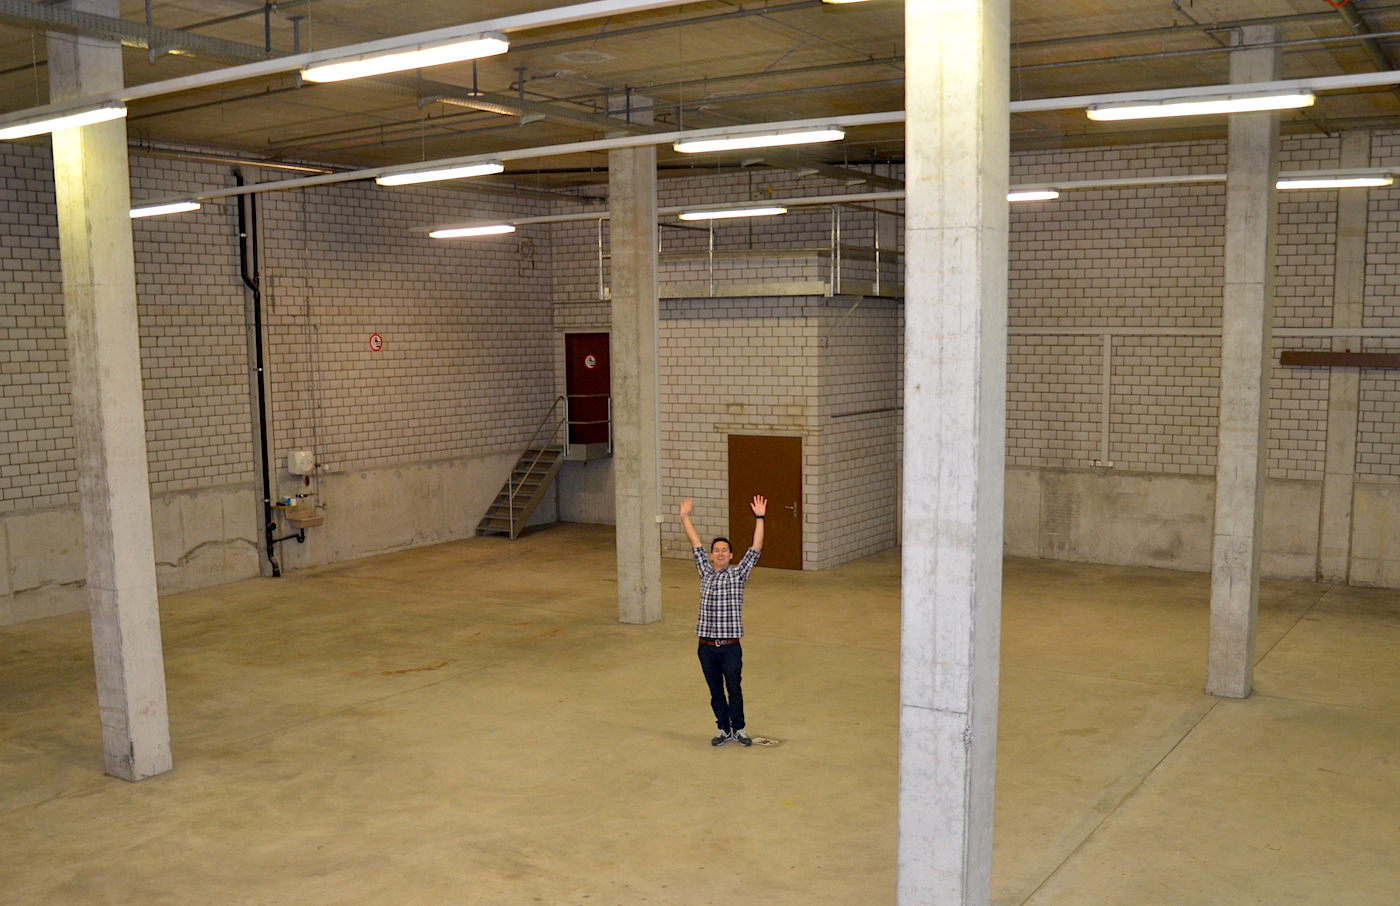 Marut Kiatprasert in der noch leeren Halle auf dem Lorzenareal in Baar.